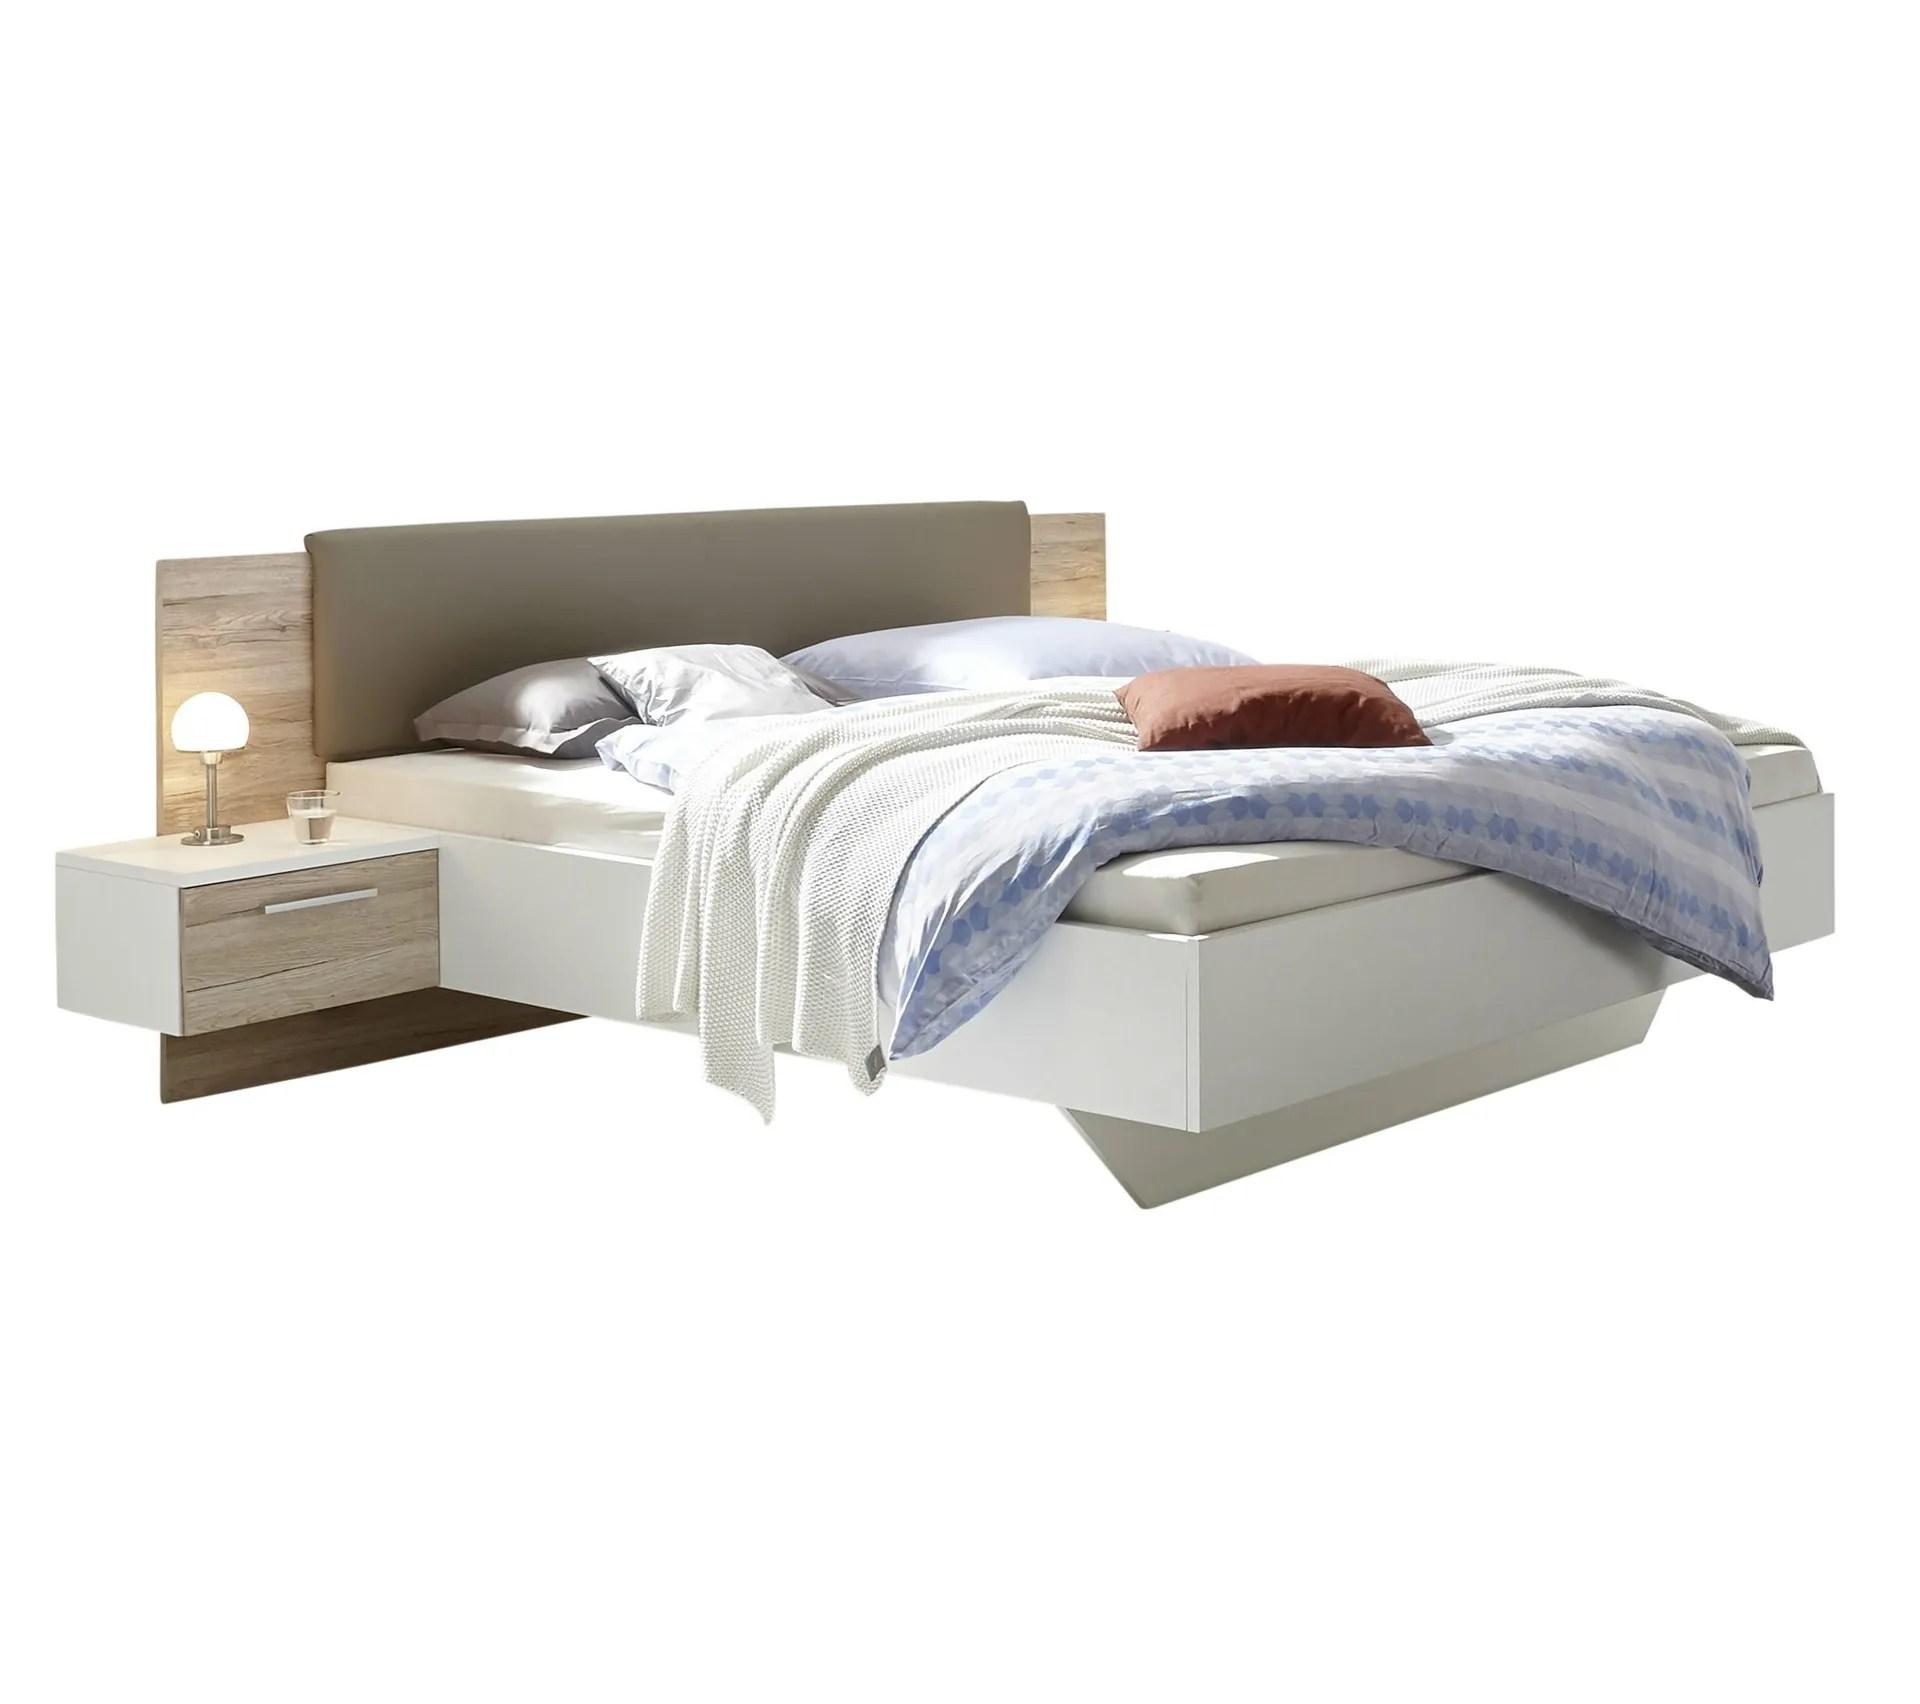 lit 140x190 cm avec chevets suspendus gravita imitation chene et blanc